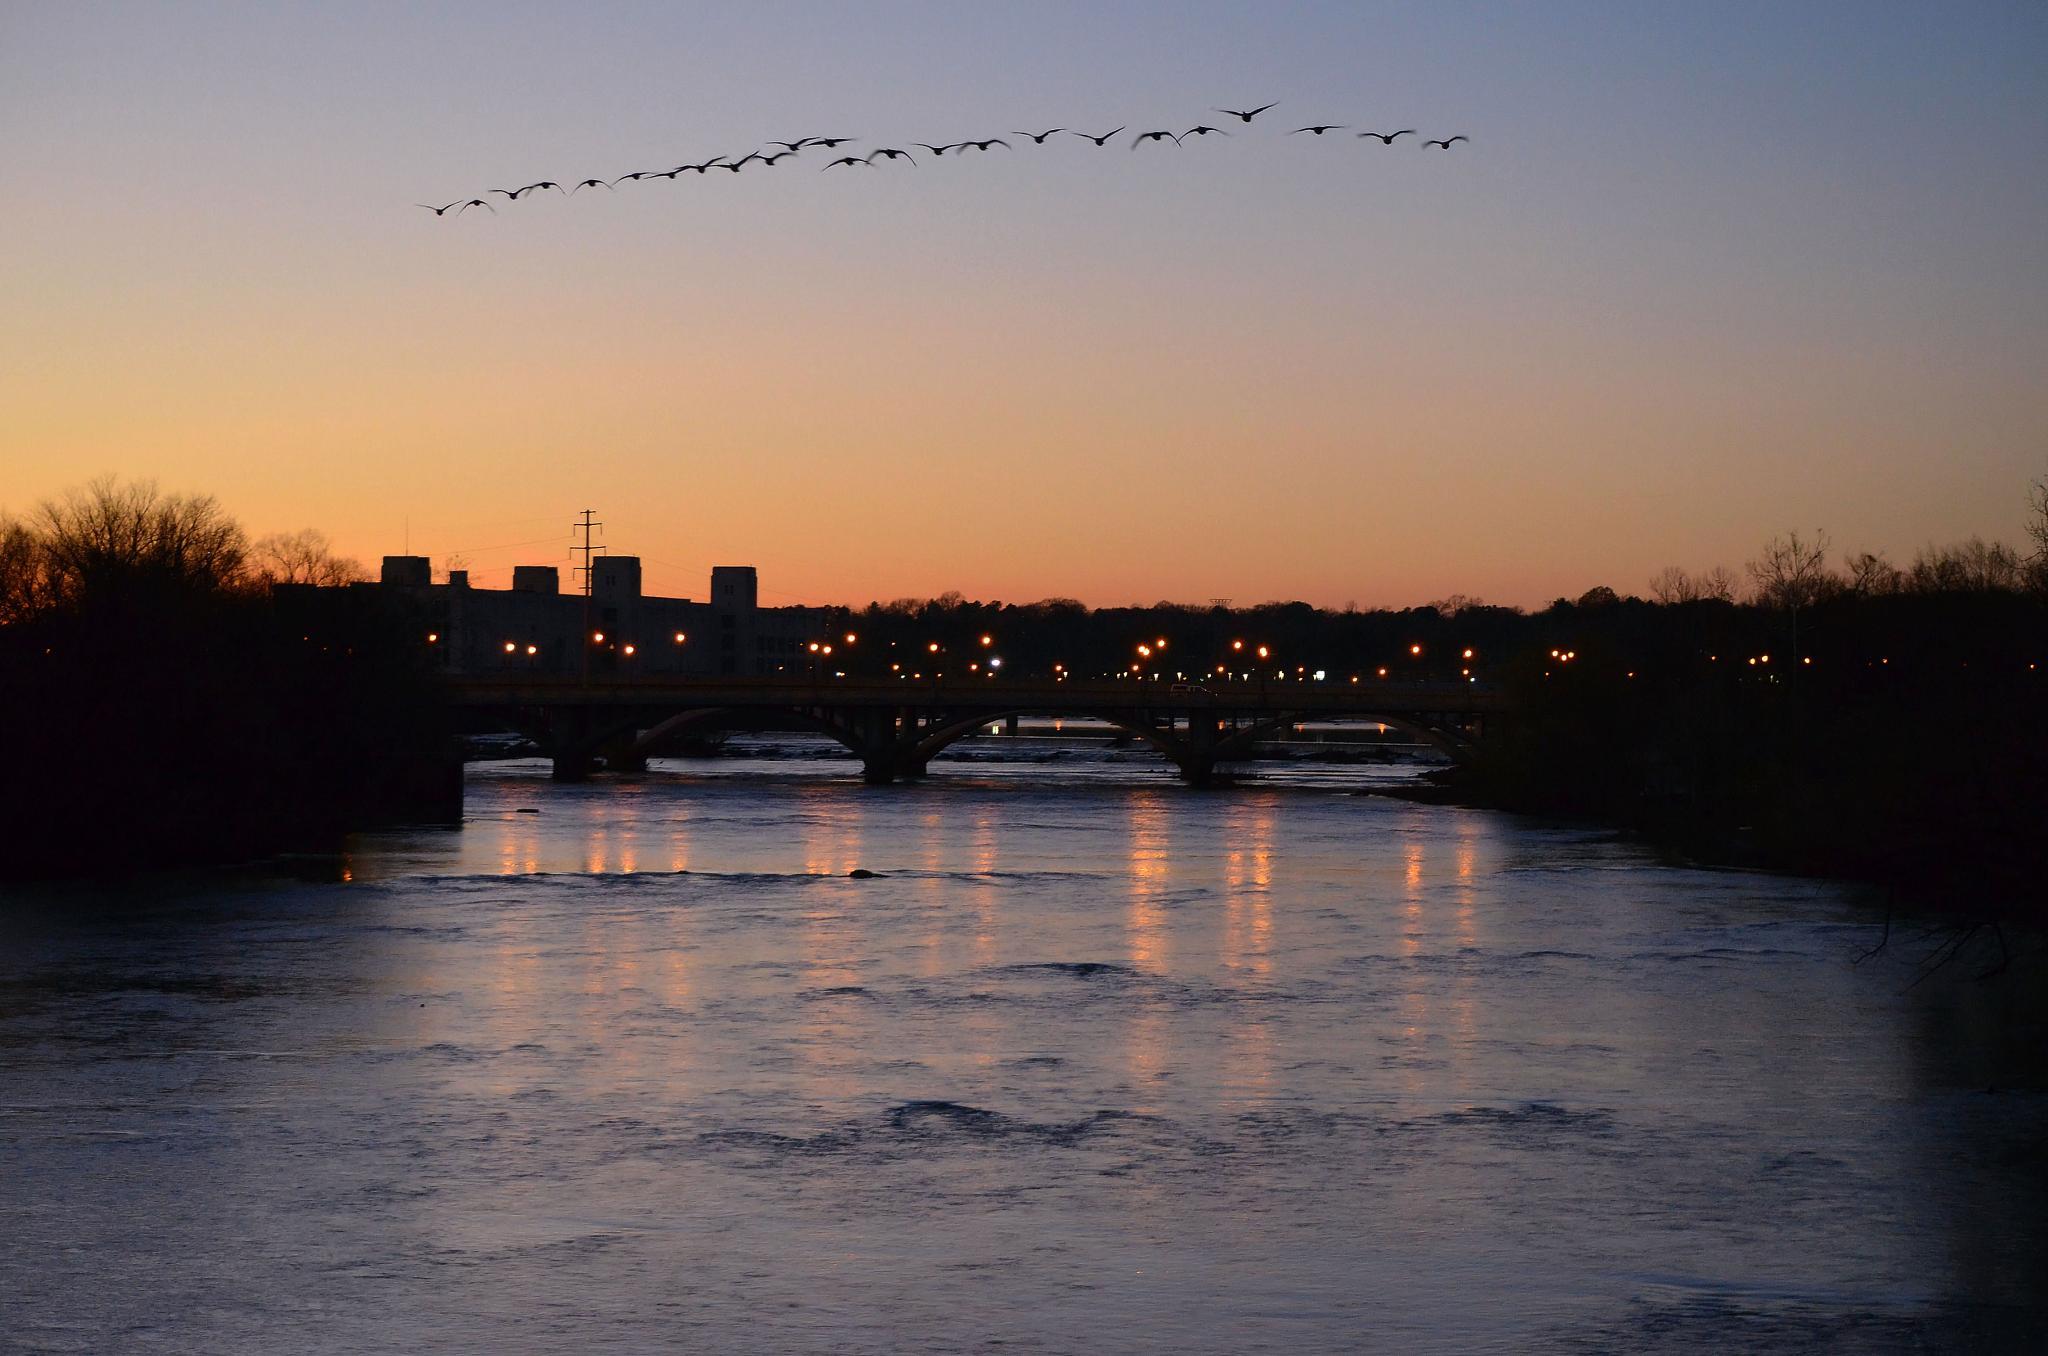 Evening Flight by JimFleenor